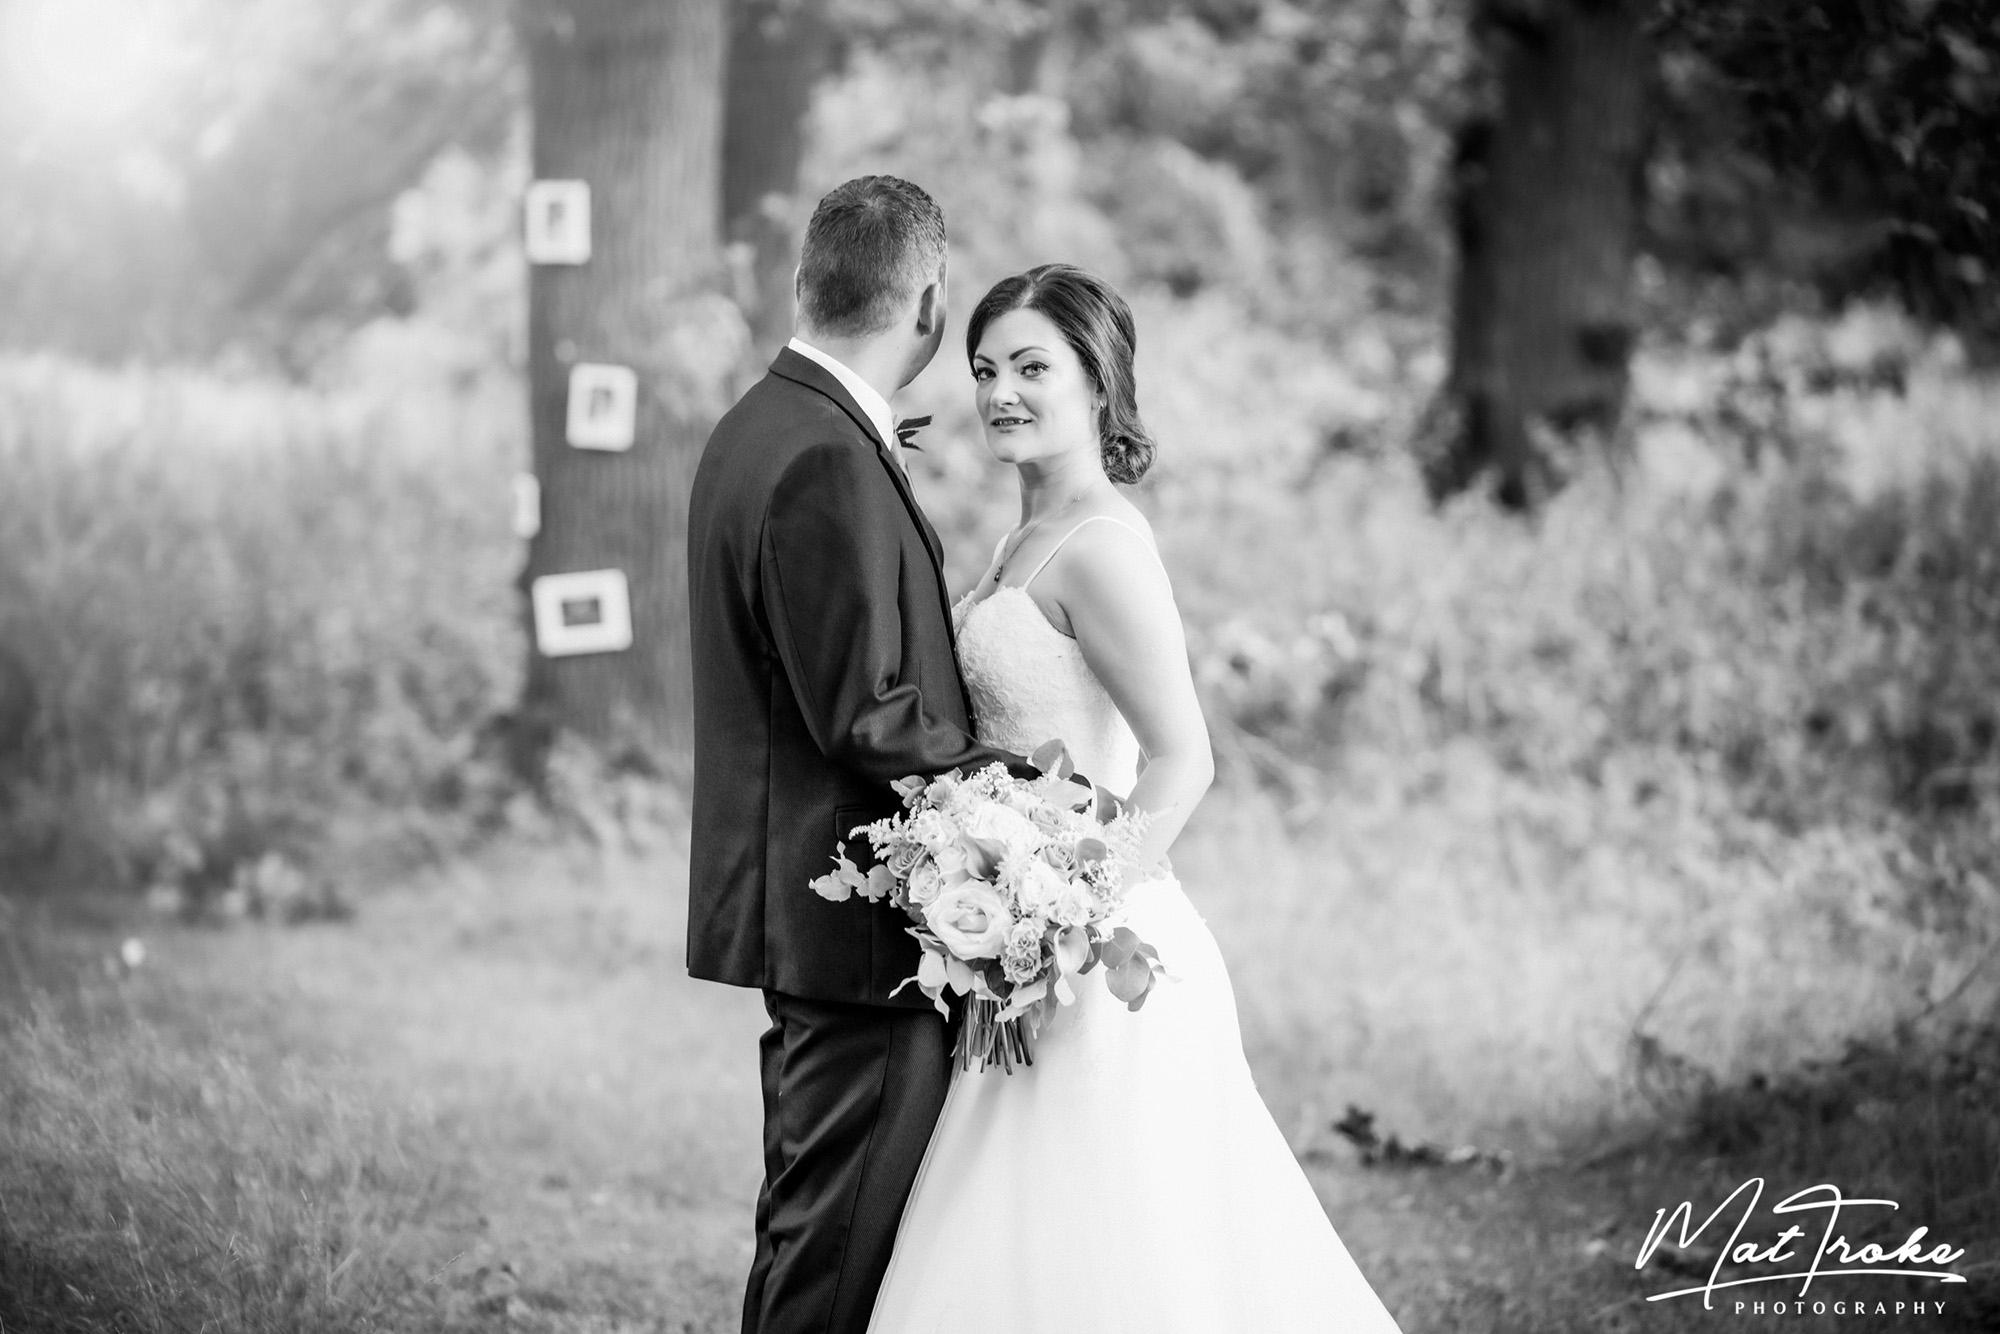 kelham_house_bride_groom_summer_wedding_photography_photographer